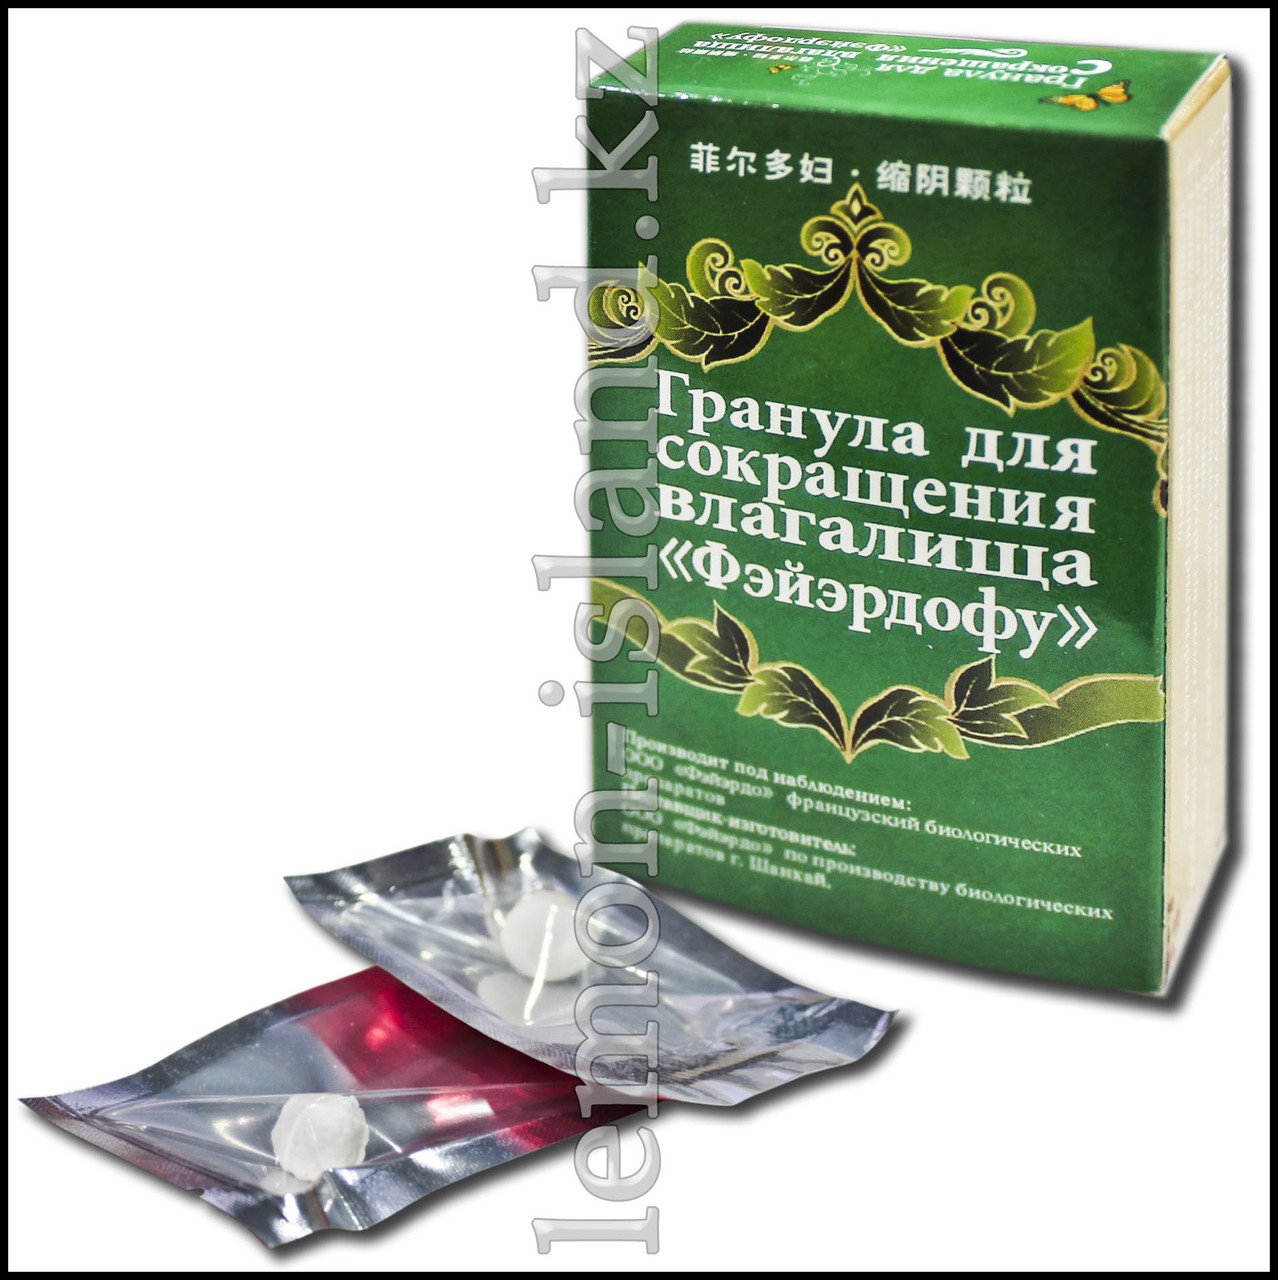 "Гранула для сокращения влагалища ""Фэйэрдофу"" (""Бальзама"")."